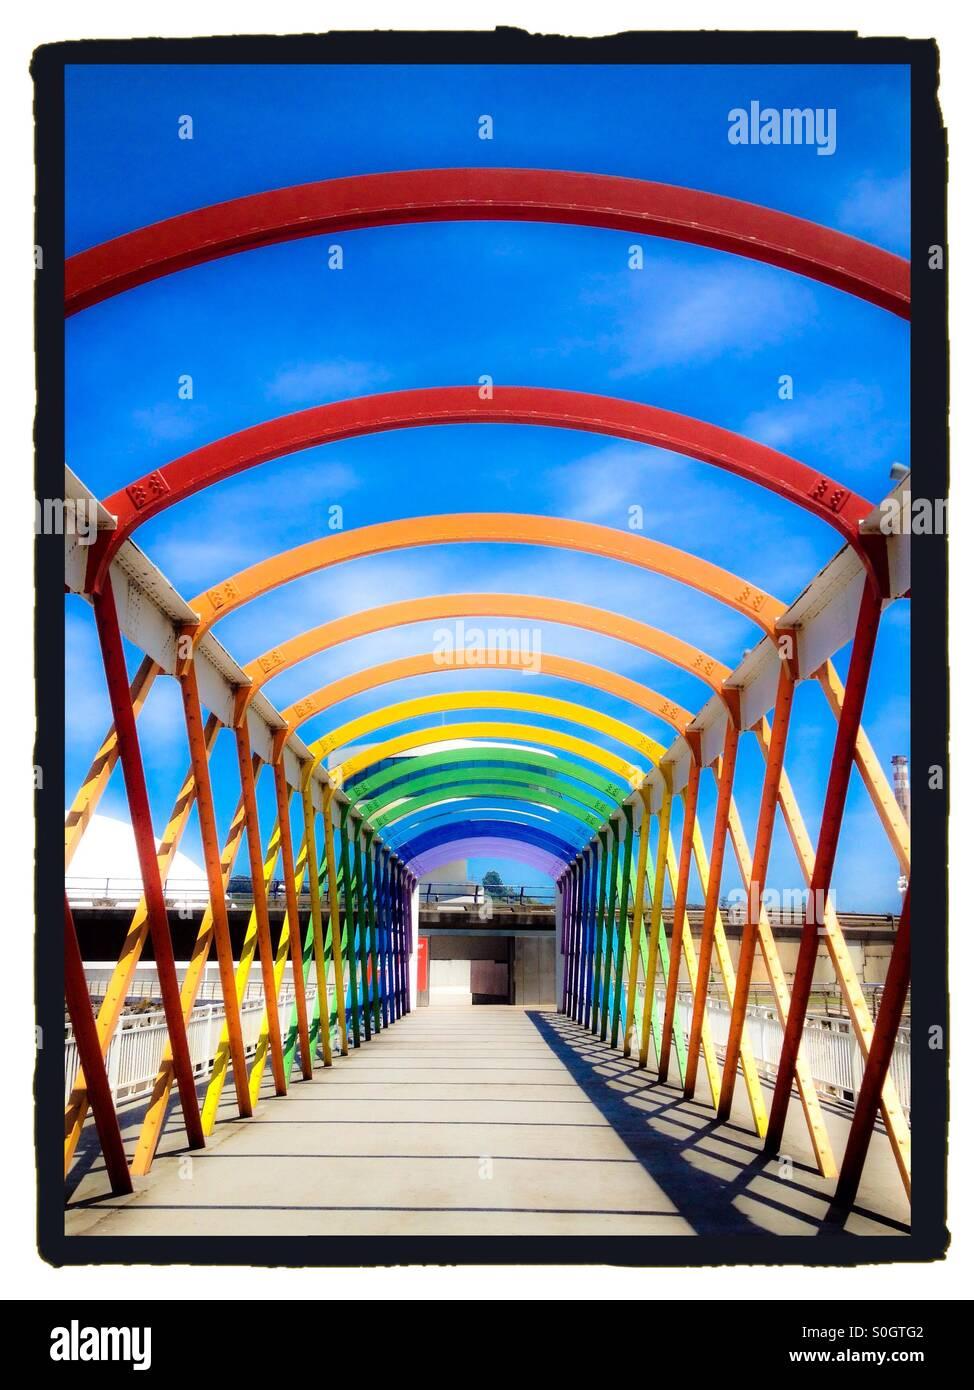 Colorful Bridge to Niemeyer Center in Aviles, Spain - Stock Image